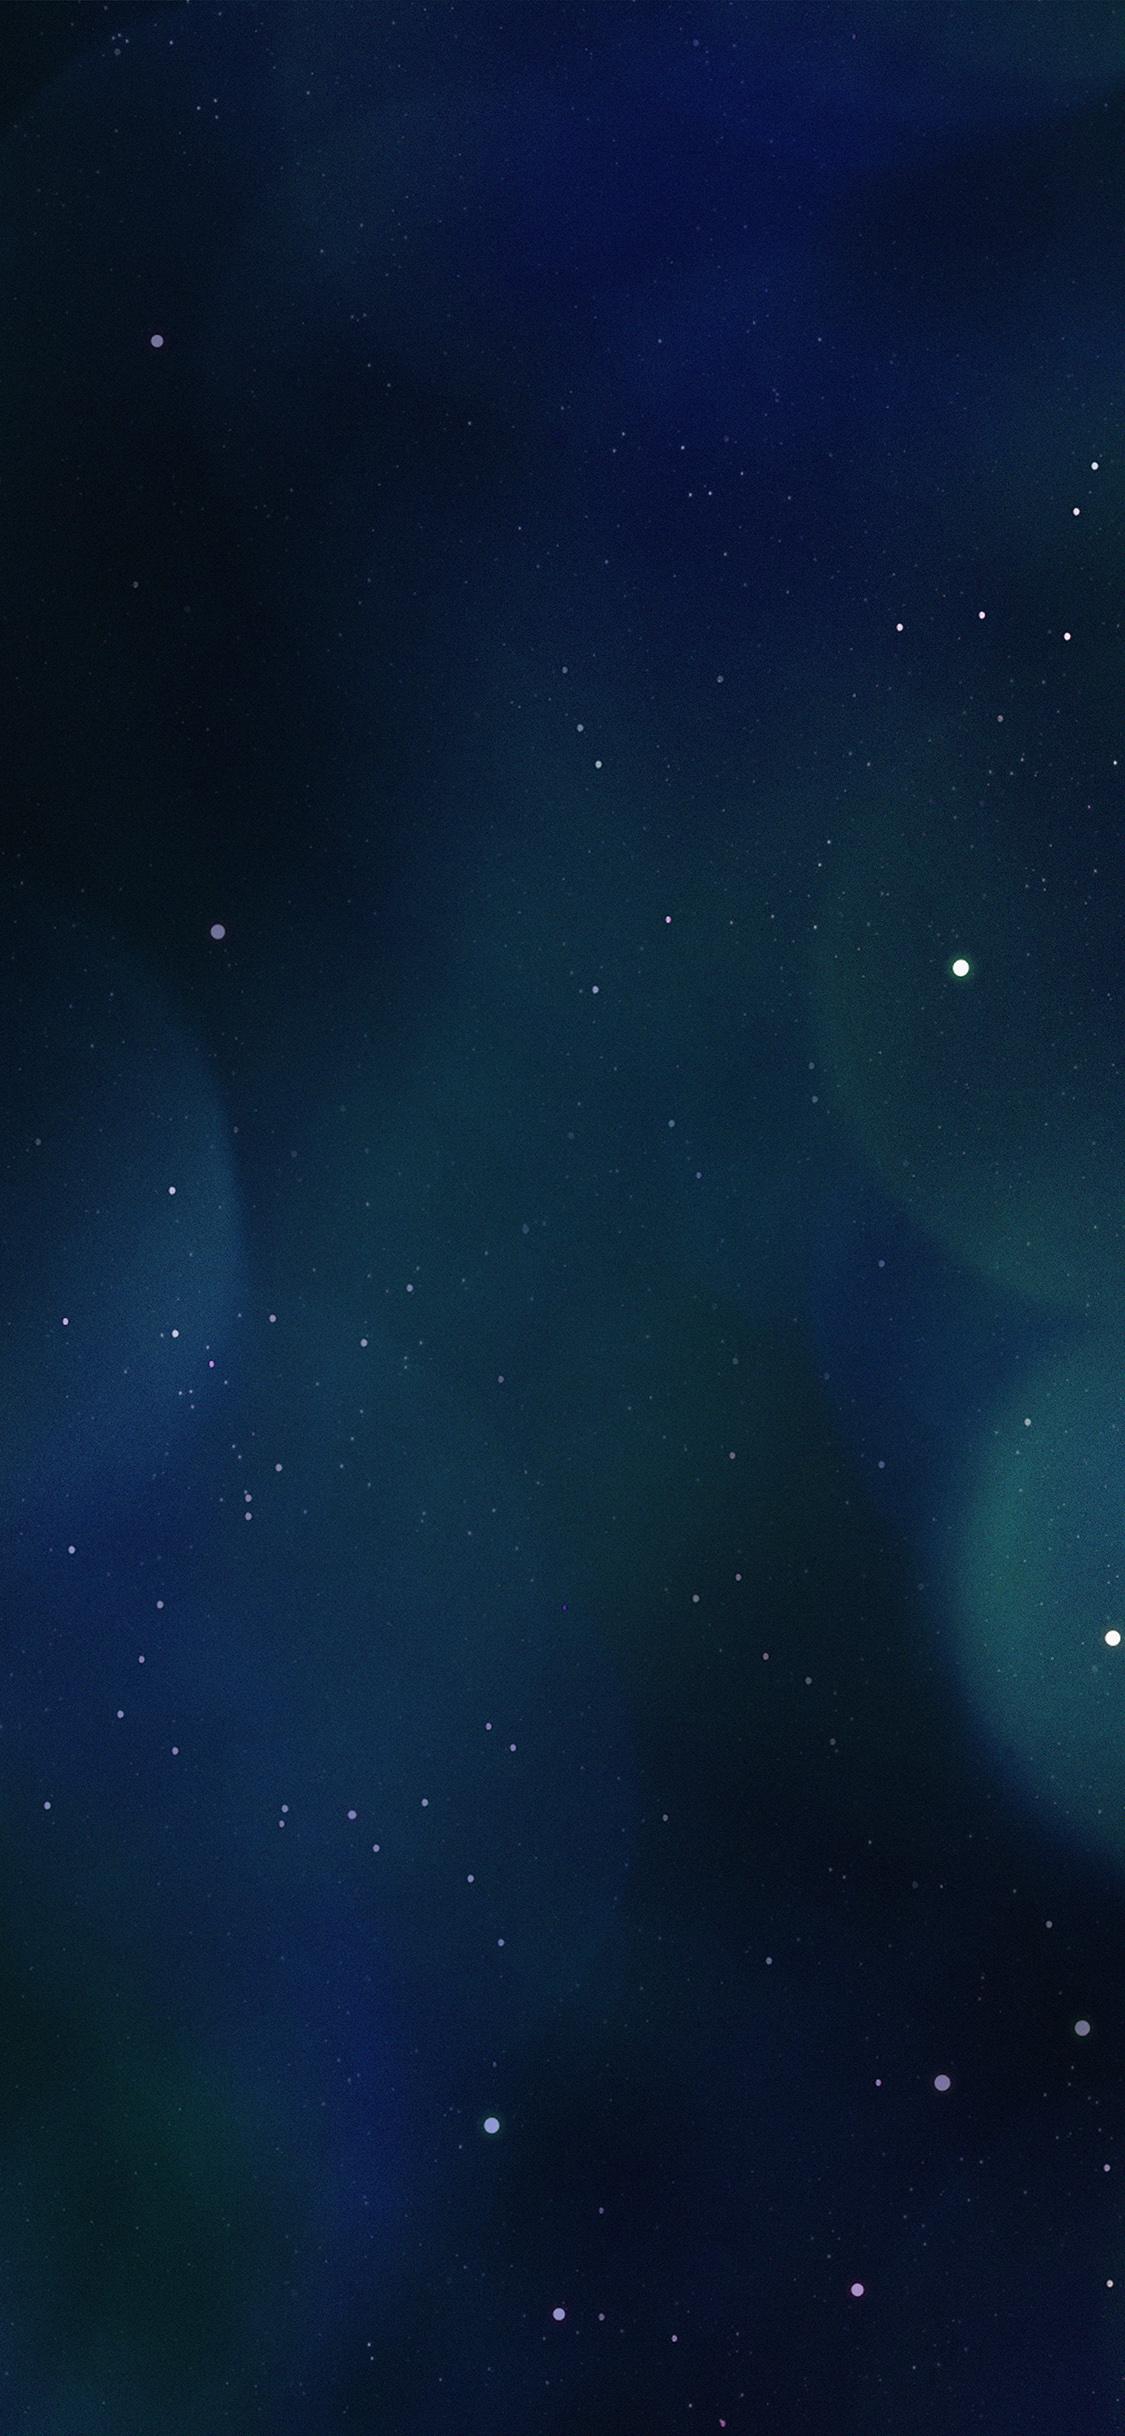 iPhonexpapers.com-Apple-iPhone-wallpaper-ak10-briar-rose-space-blue-flare-art